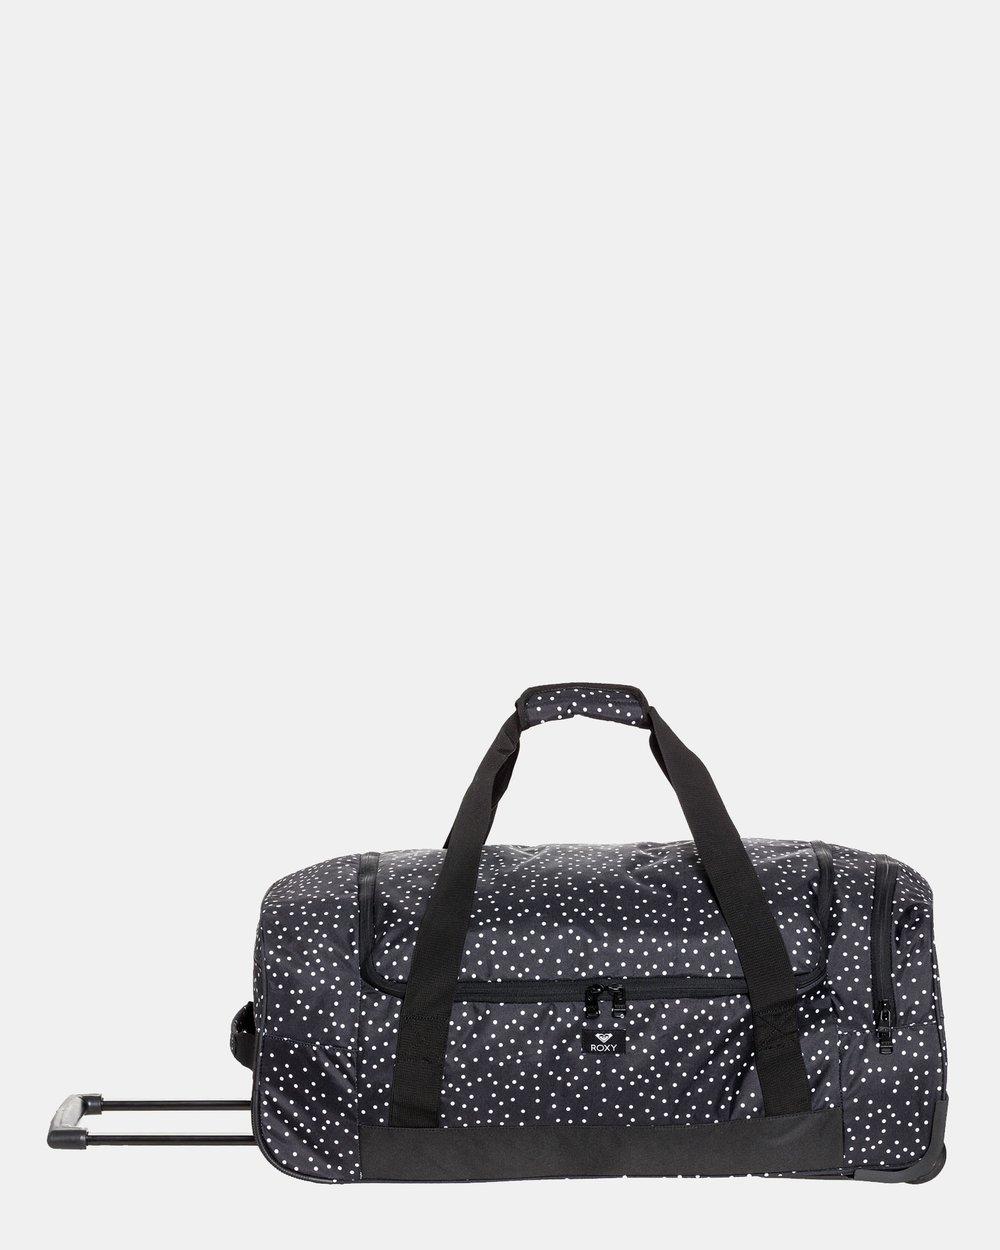 Distance Across Large Wheeled Duffle Travel Bag by Roxy Online  b85e4e315016d